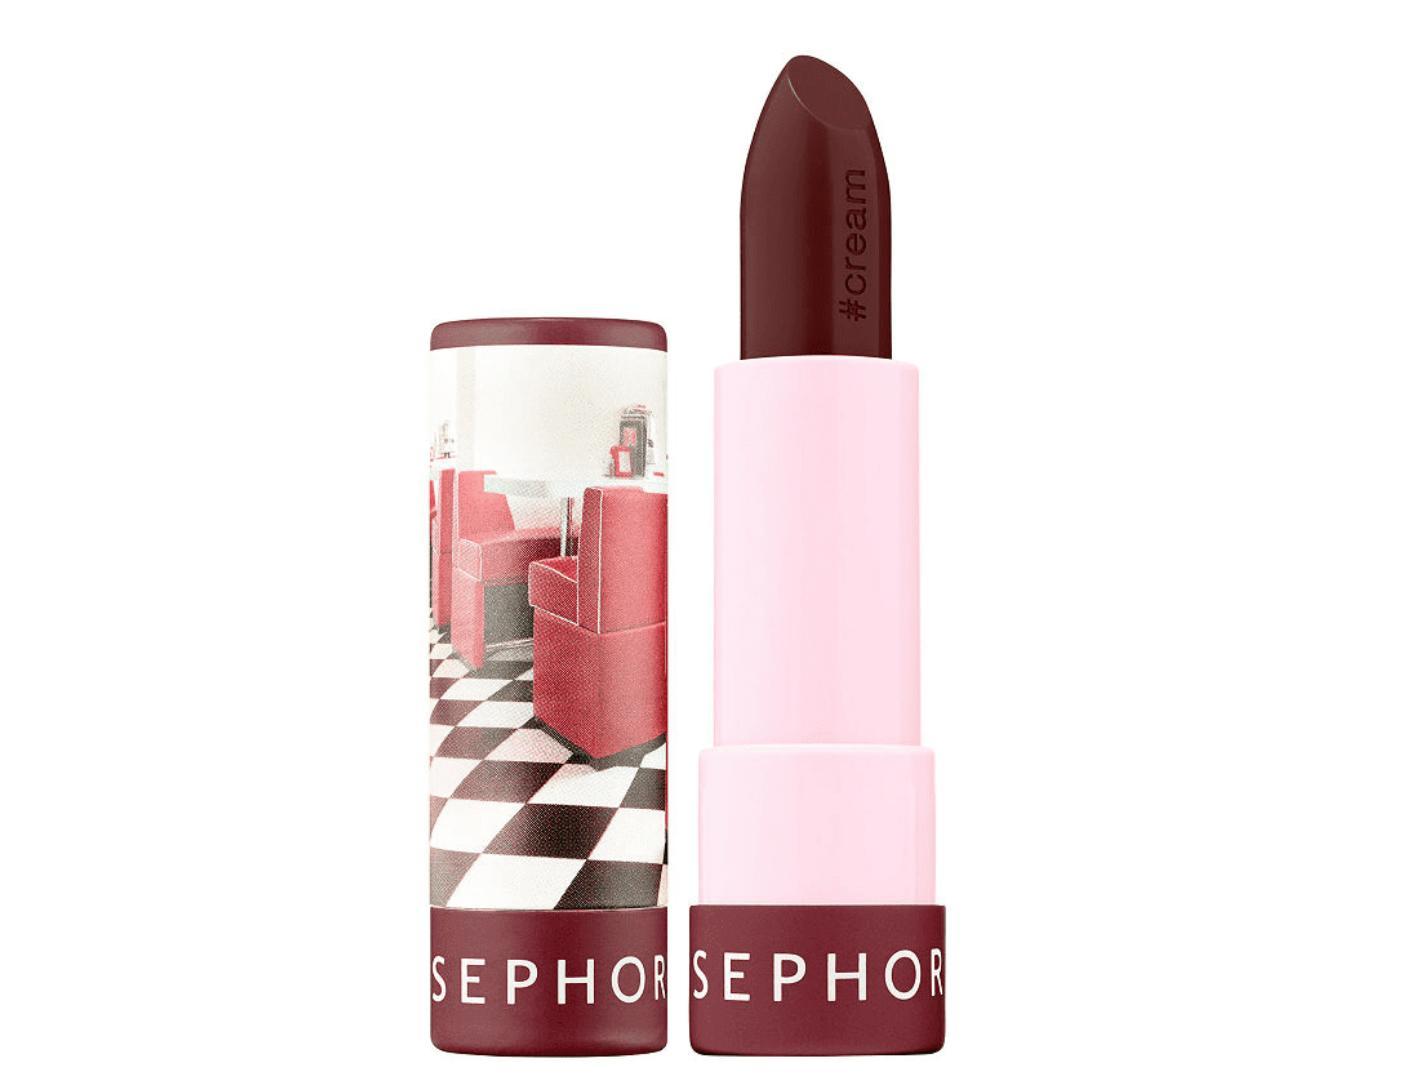 Sephora #Lipstories Lipstick Malt Shake 29